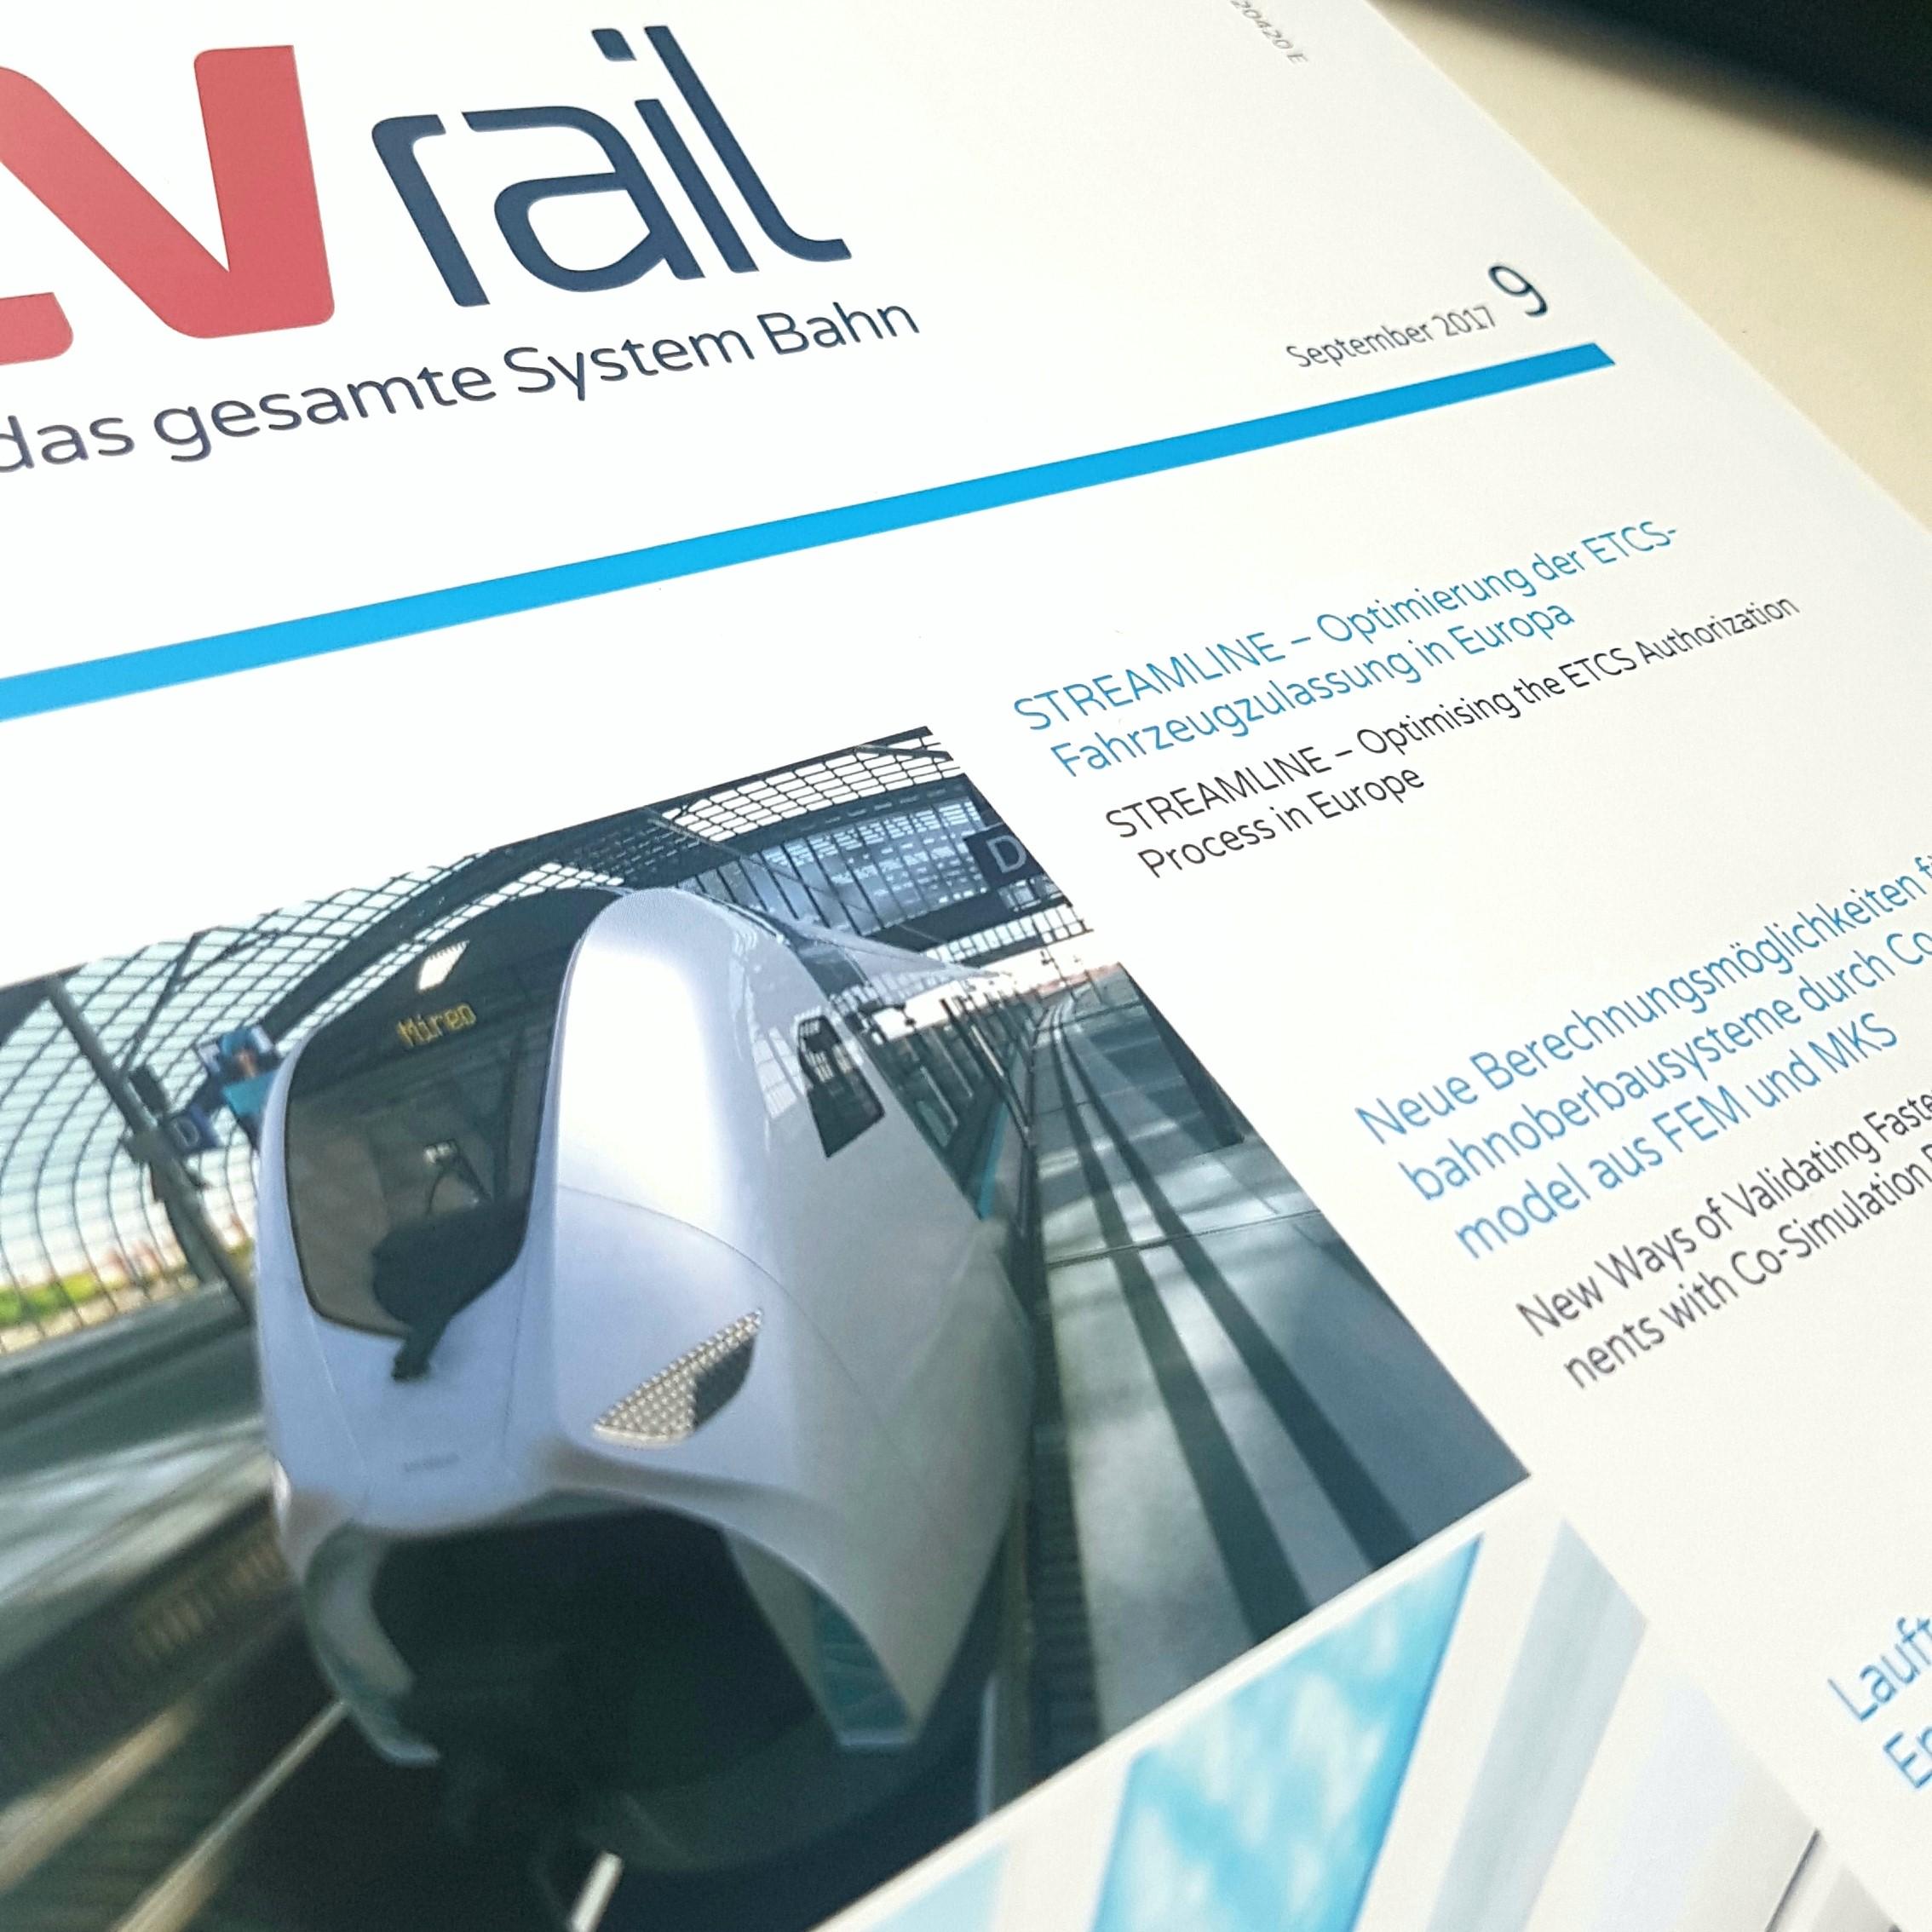 Streamline: Optimierung der ETCS-Fahrzeugzulassung in Europa